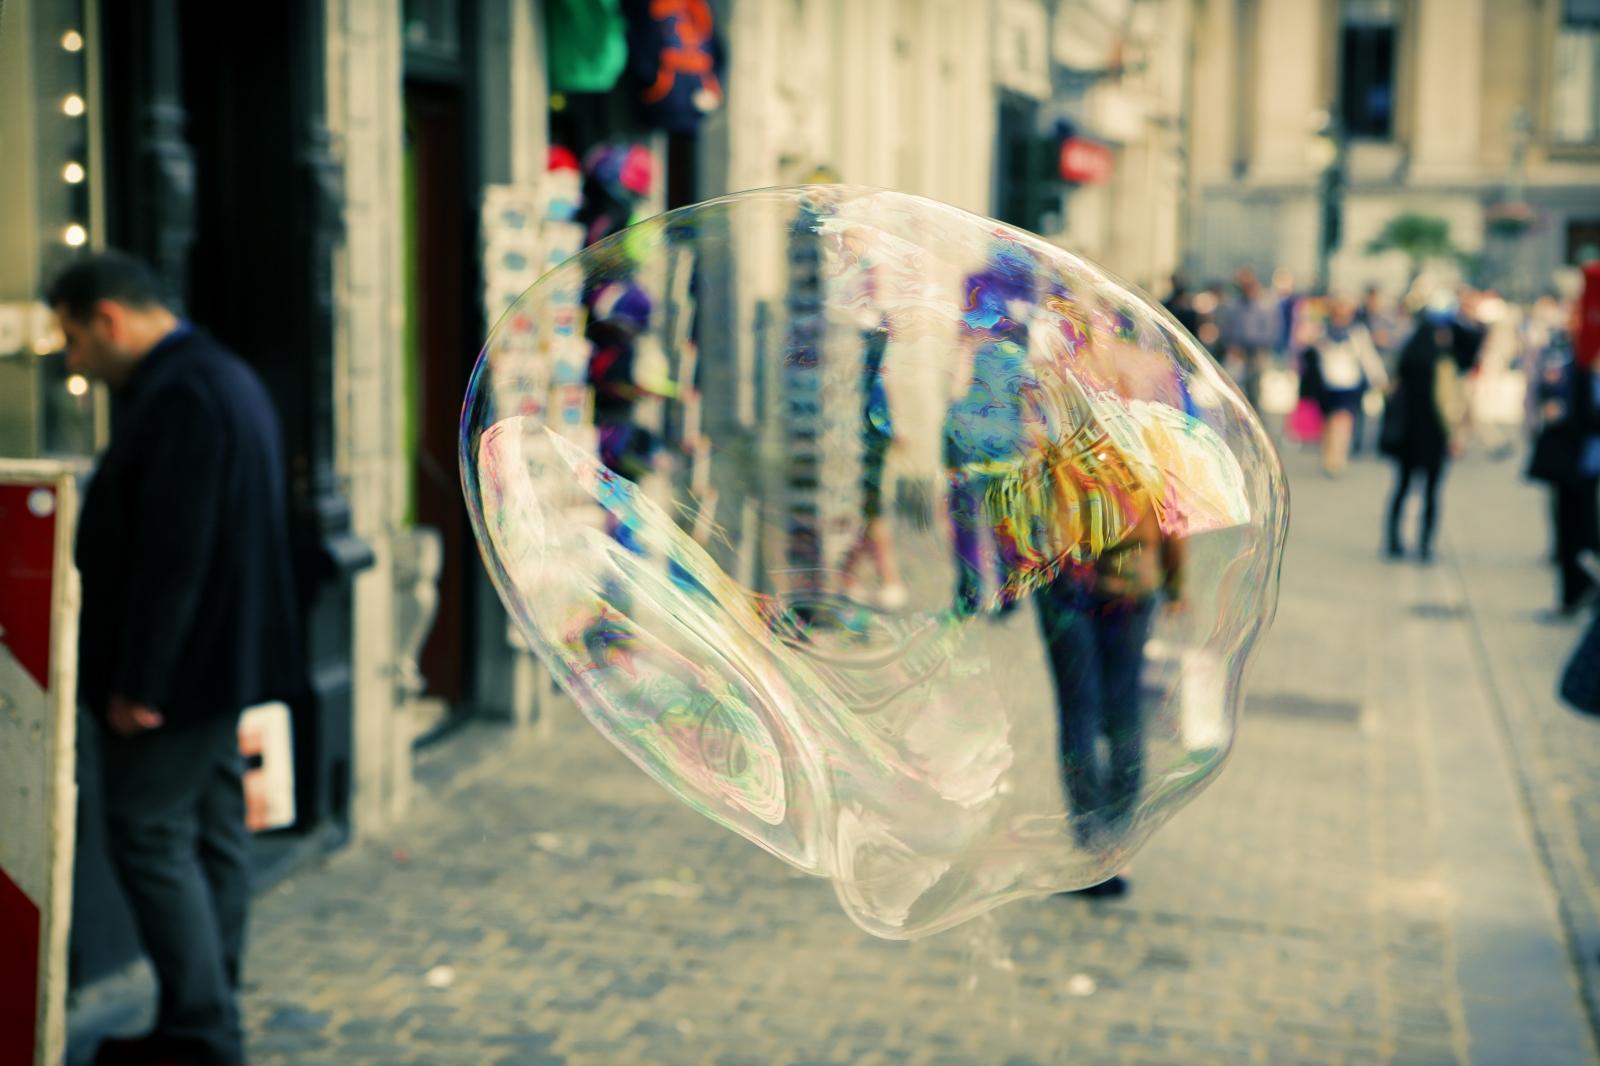 2014-07-life-of-pix-free-stock-Leger comme une bulle-belgium-brussels-city-soap-bubble